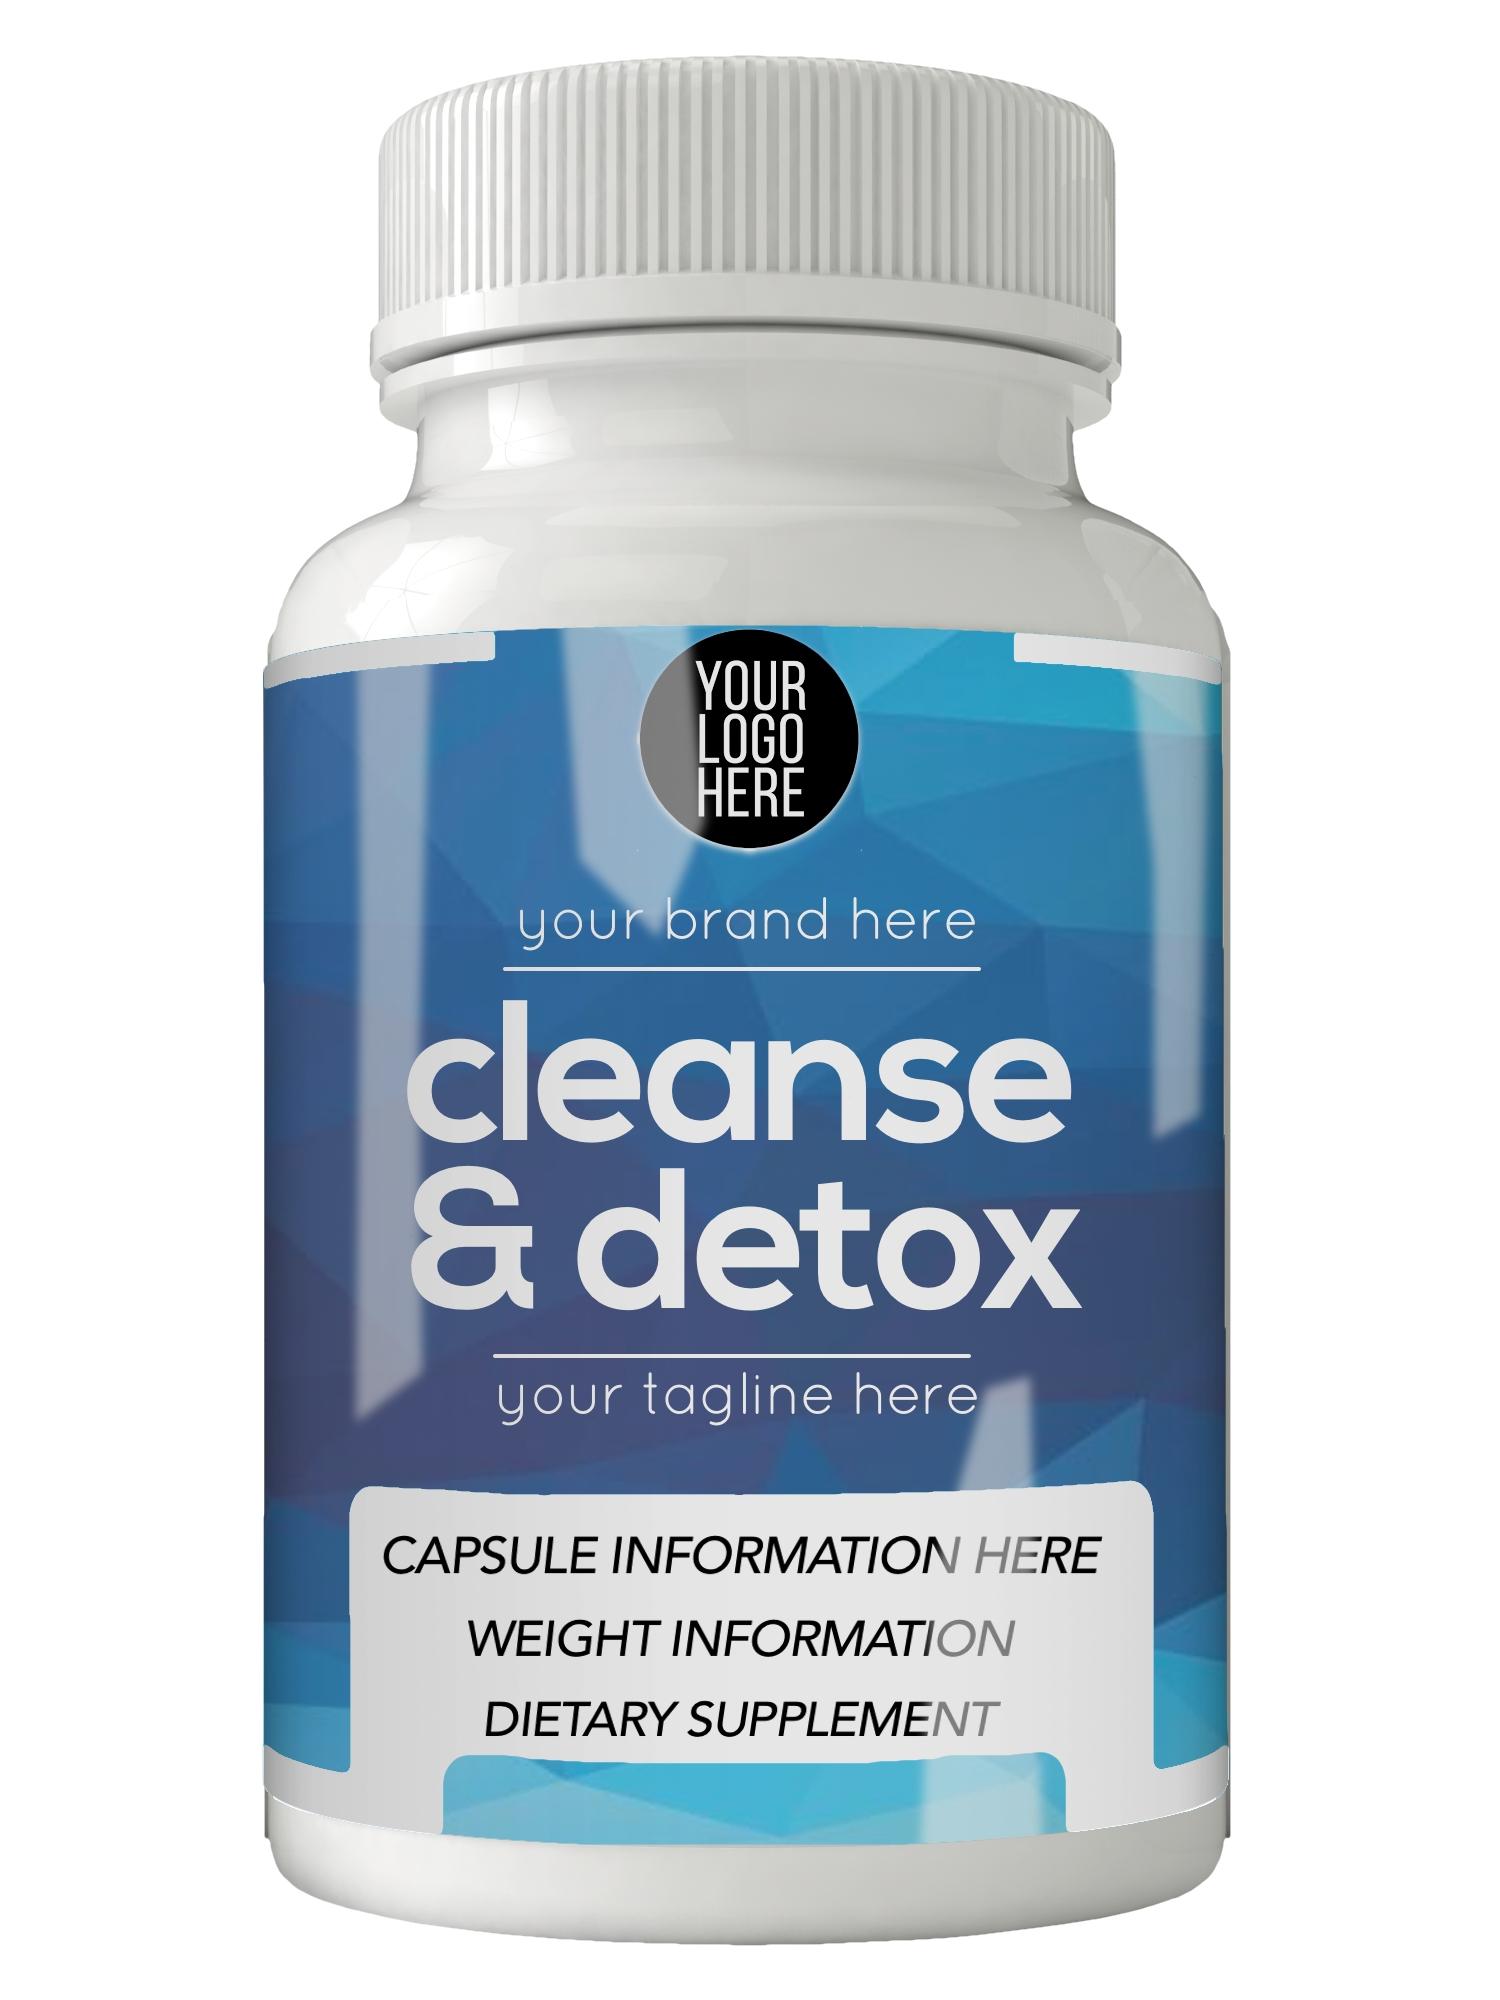 asl cleanse and detox.jpg